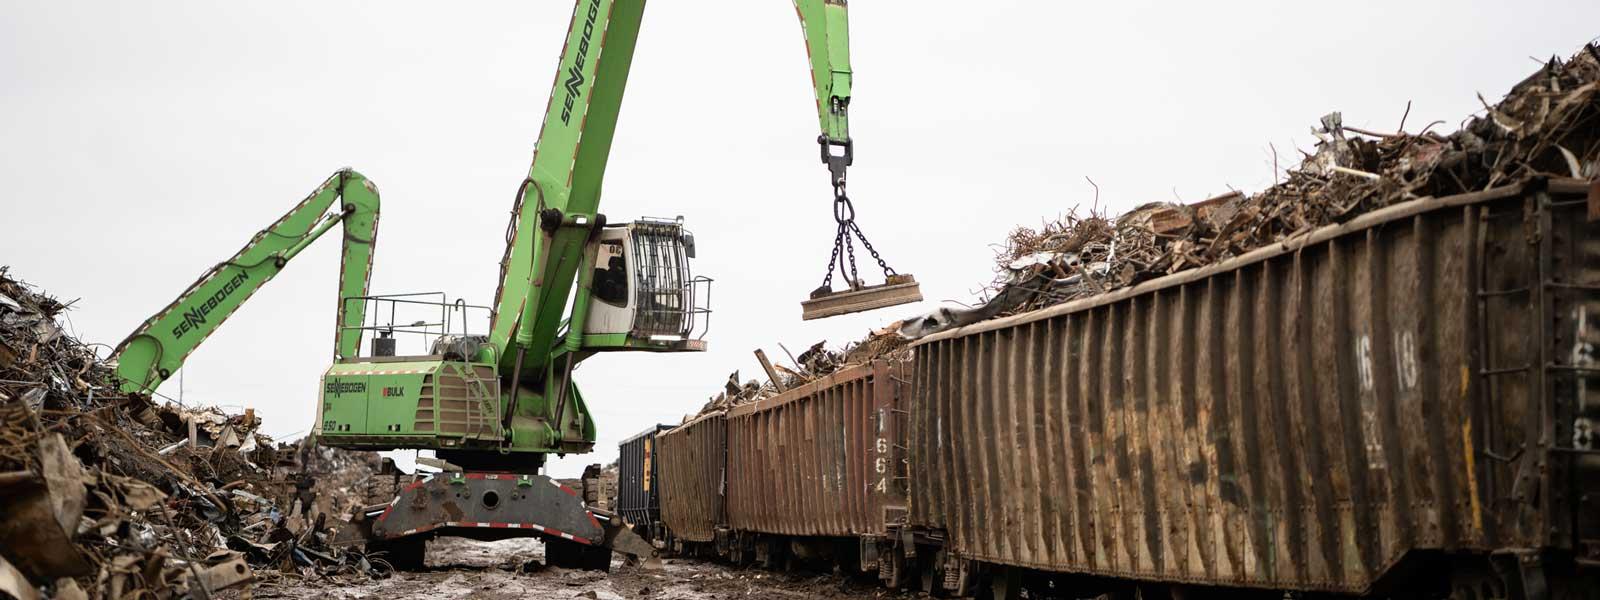 Senebogen Material Handler At Scrap Recyling Site